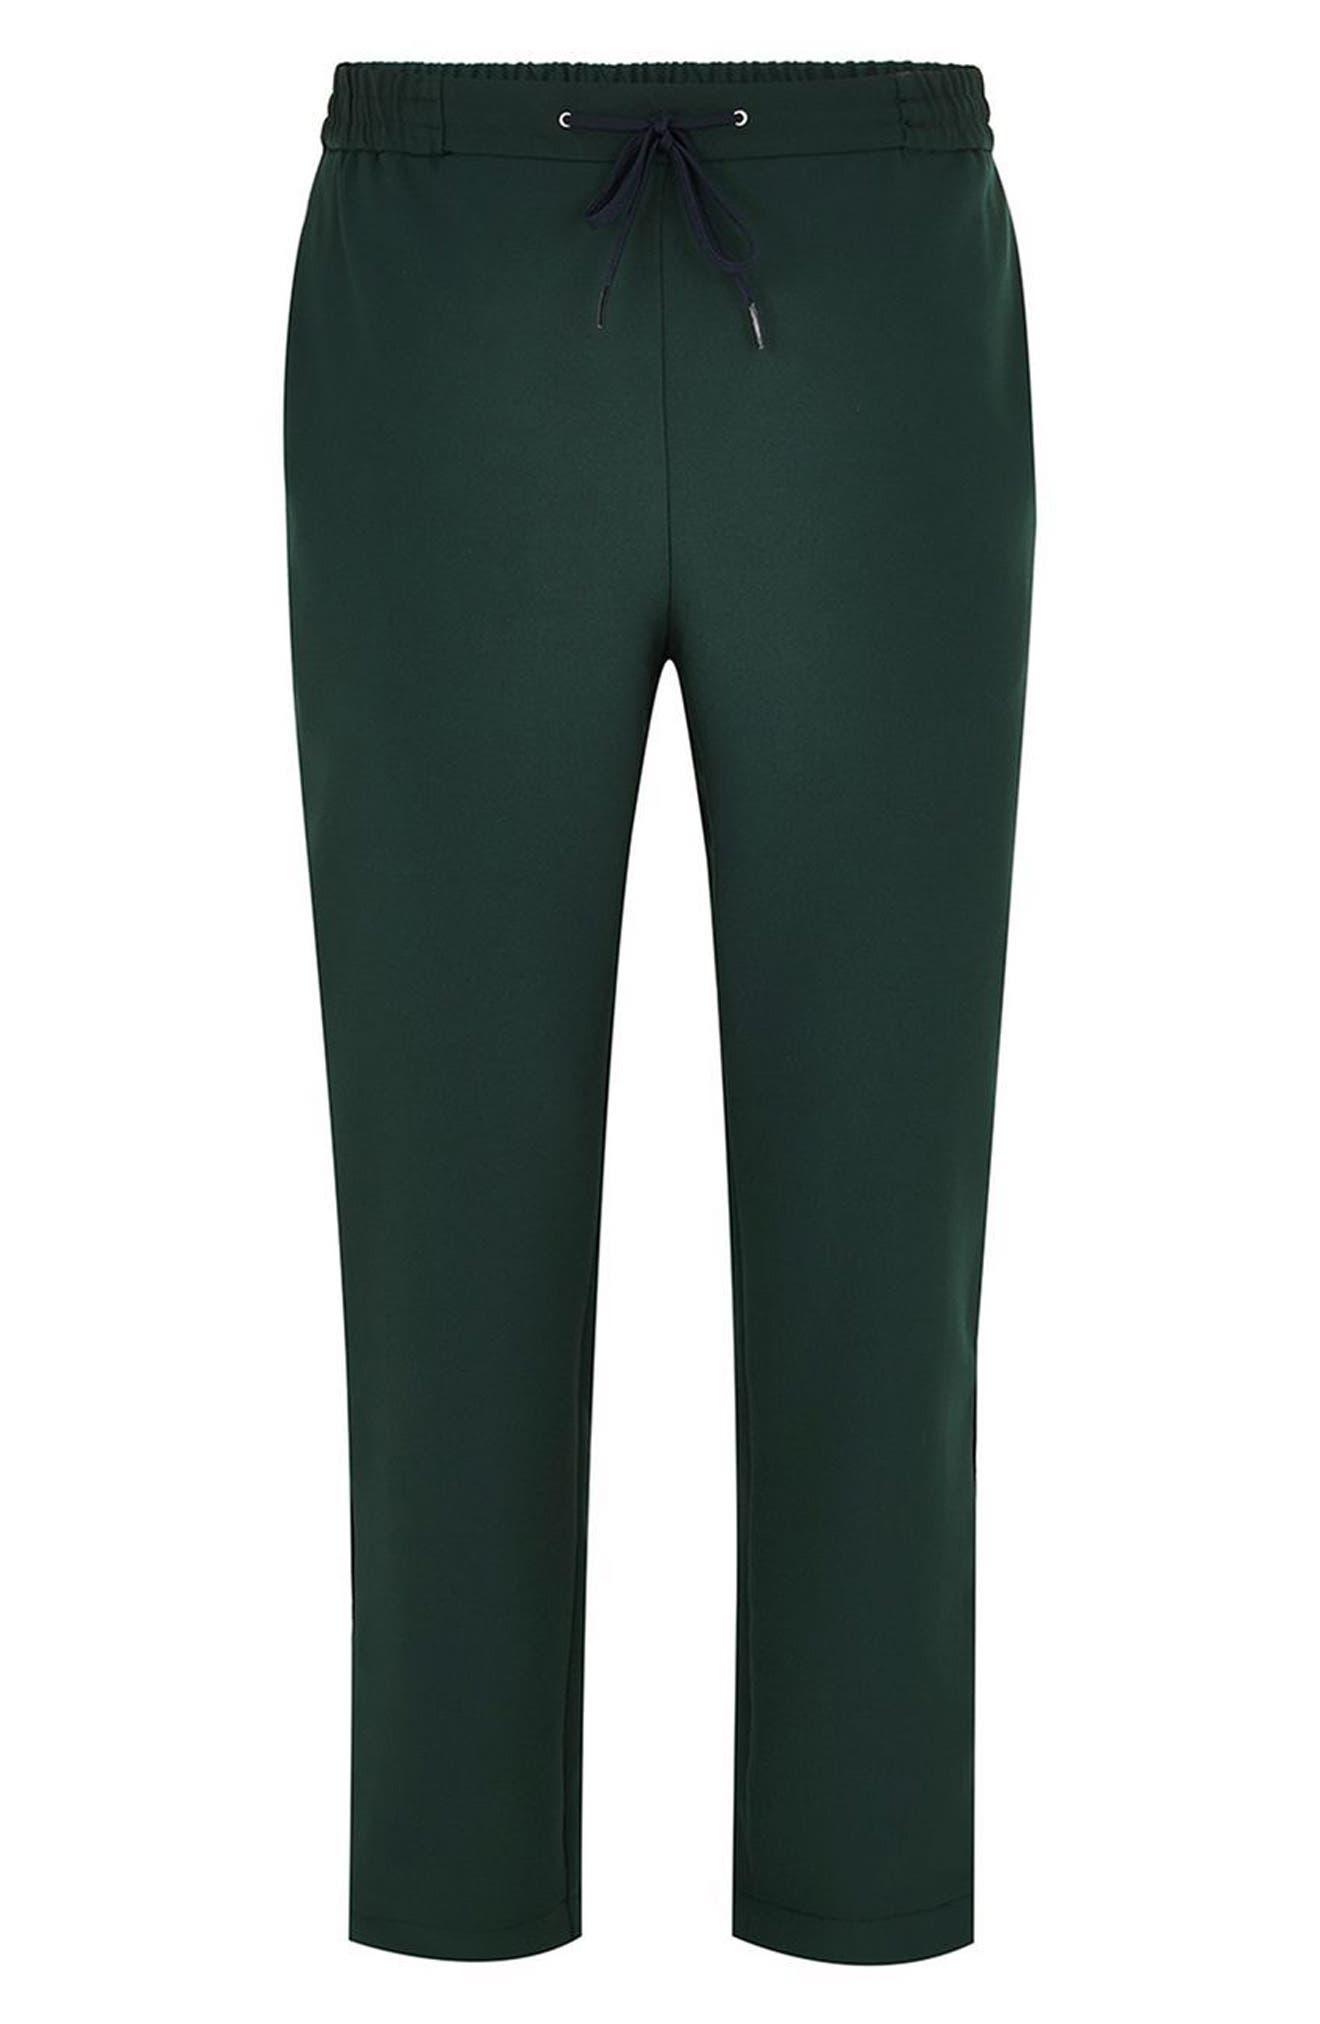 Slim Cropped Track Pants,                             Alternate thumbnail 4, color,                             Green Multi